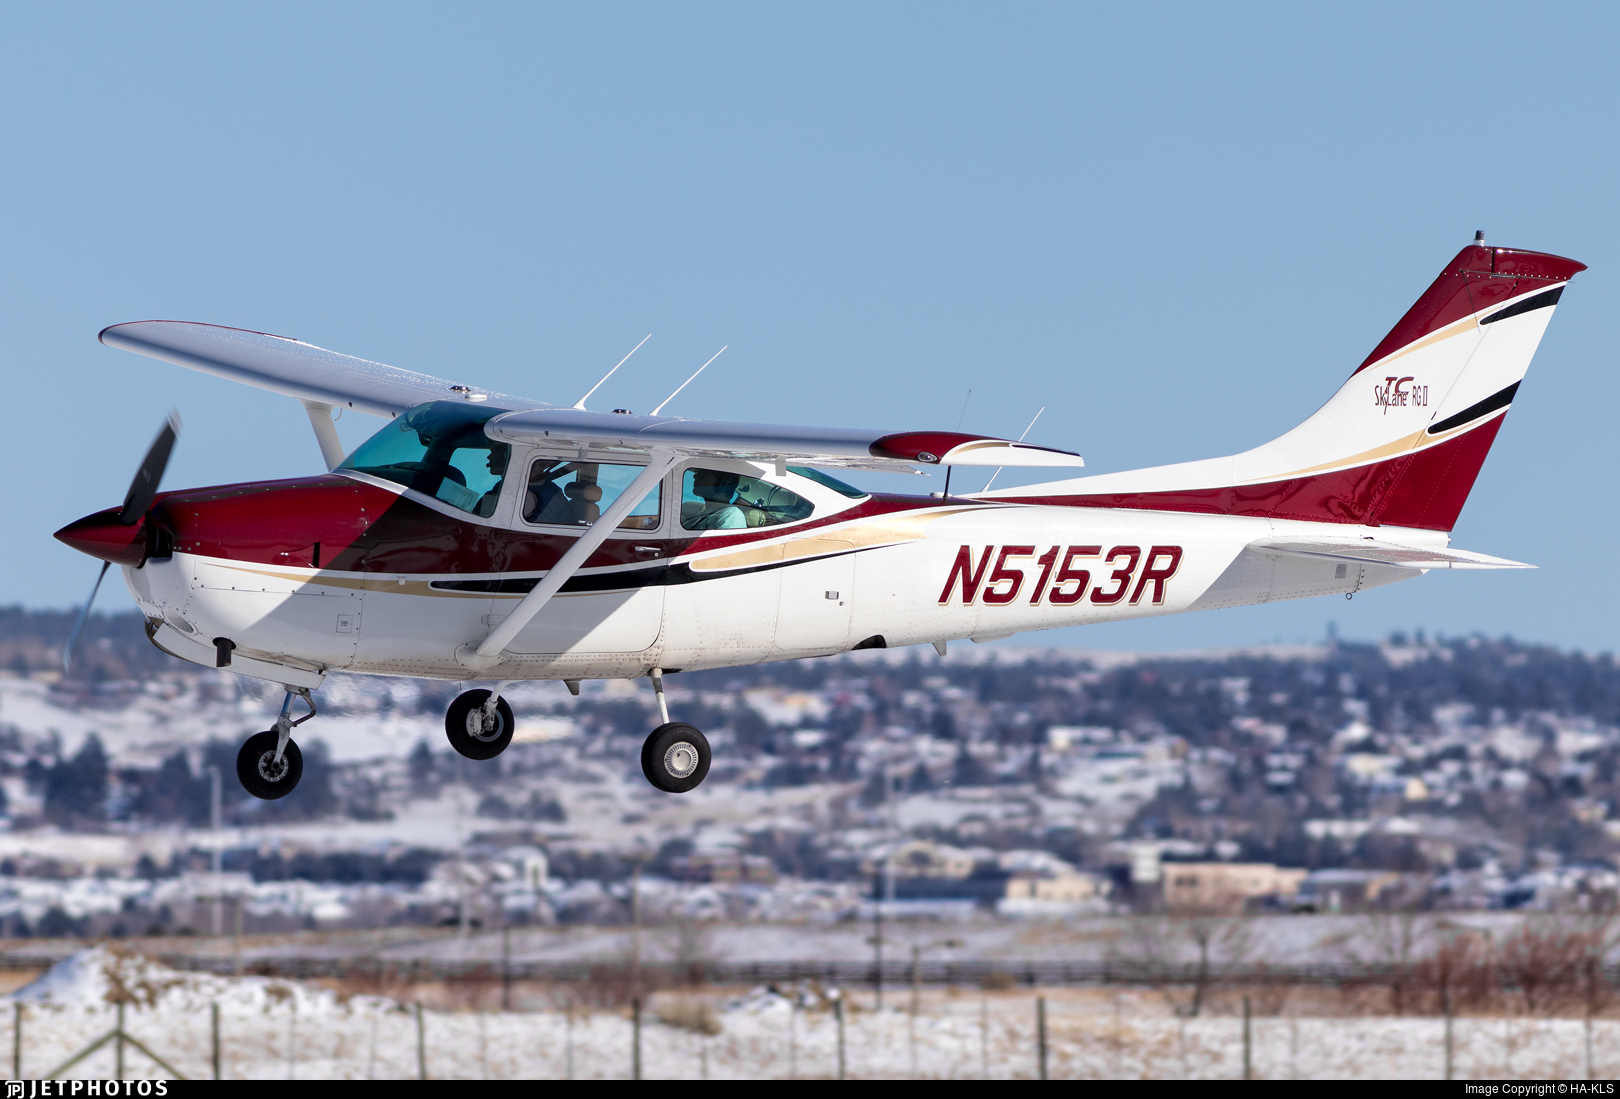 N5153R - Cessna TR182 Turbo Skylane RG - Private